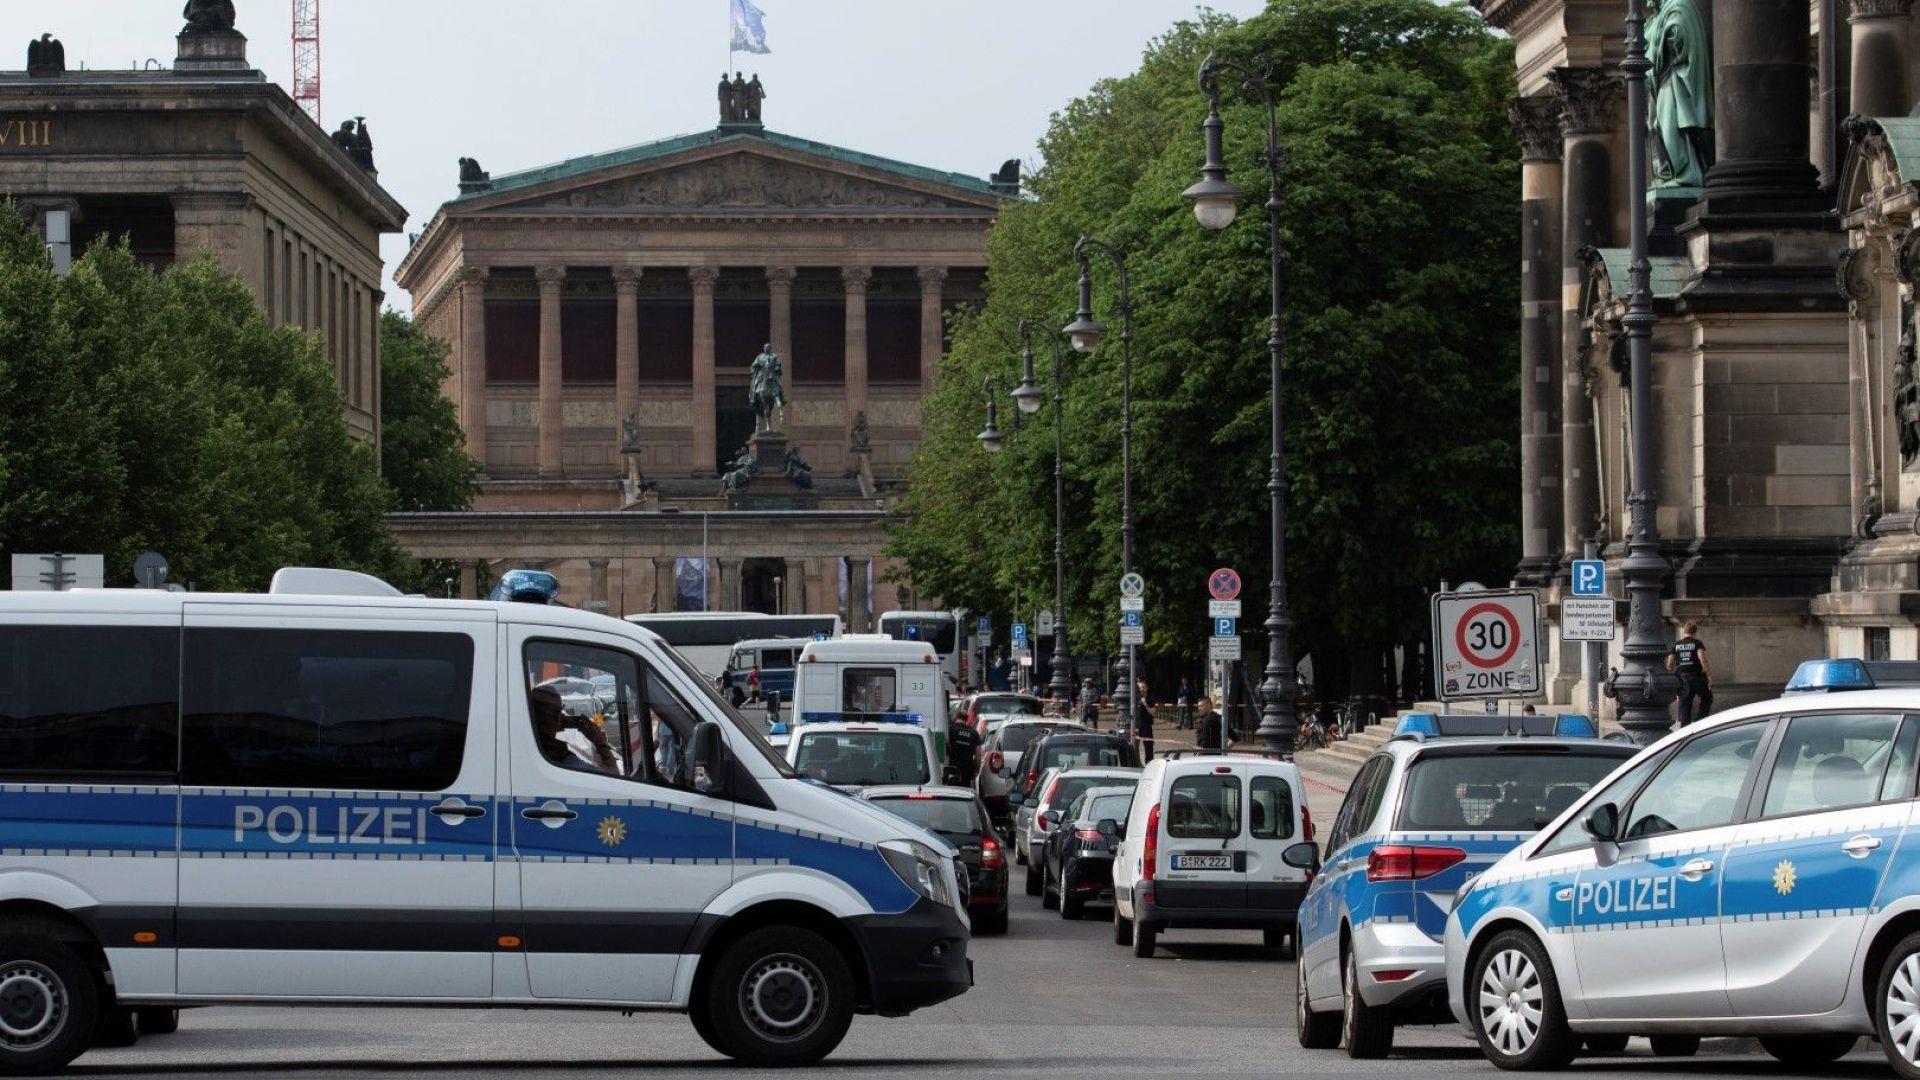 Полицай простреля мъж в Берлин, който се готвел за нападение